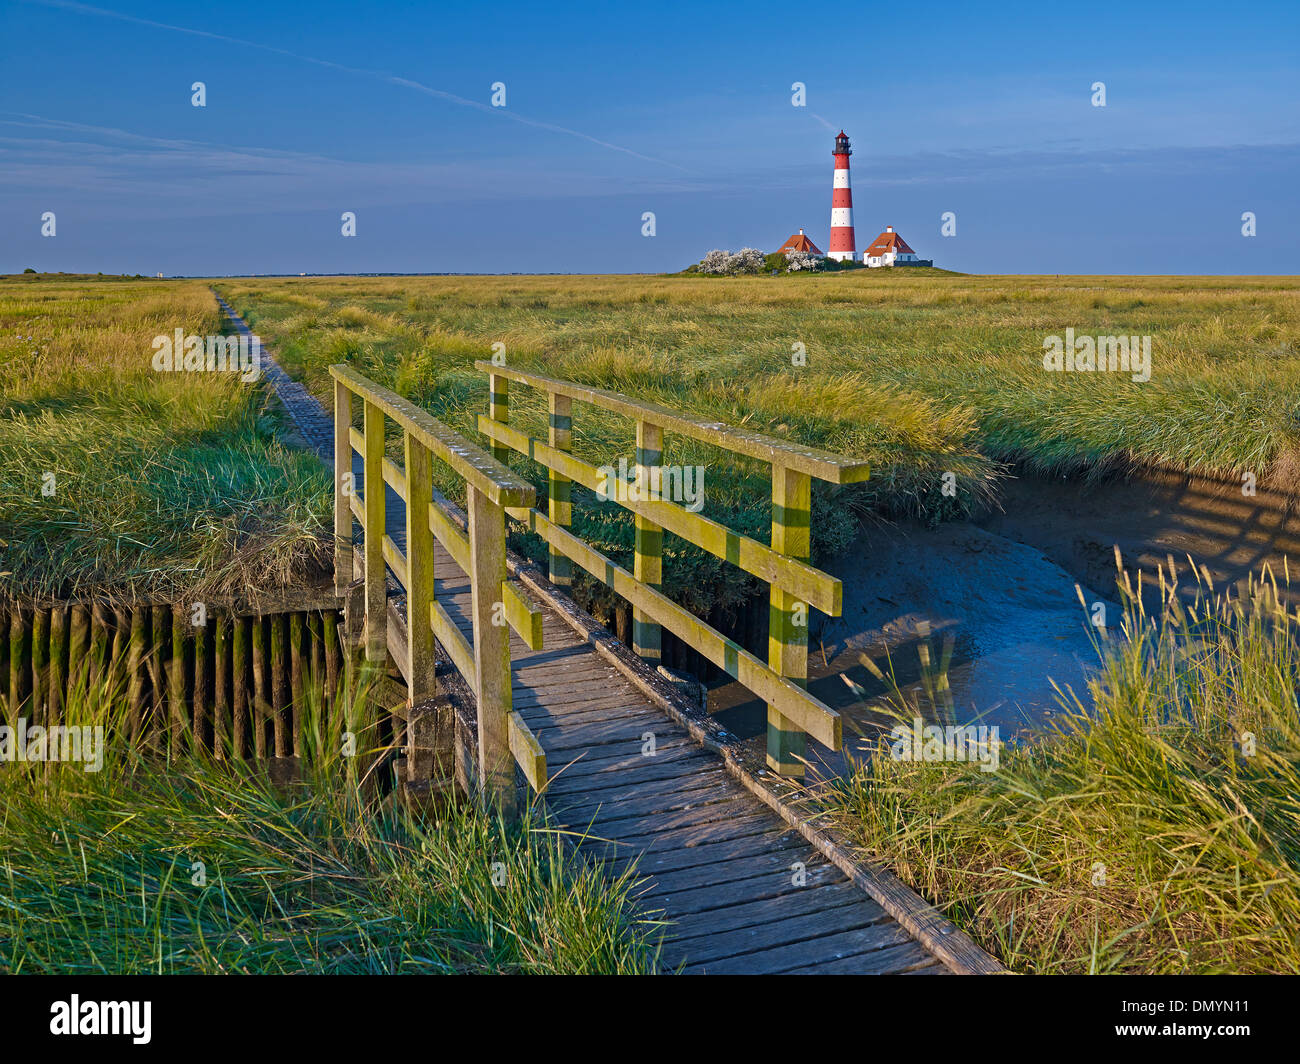 Lighthouse Westerheversand, Eiderstedt peninsula, North Frisia, Schleswig-Holstein, Germany - Stock Image